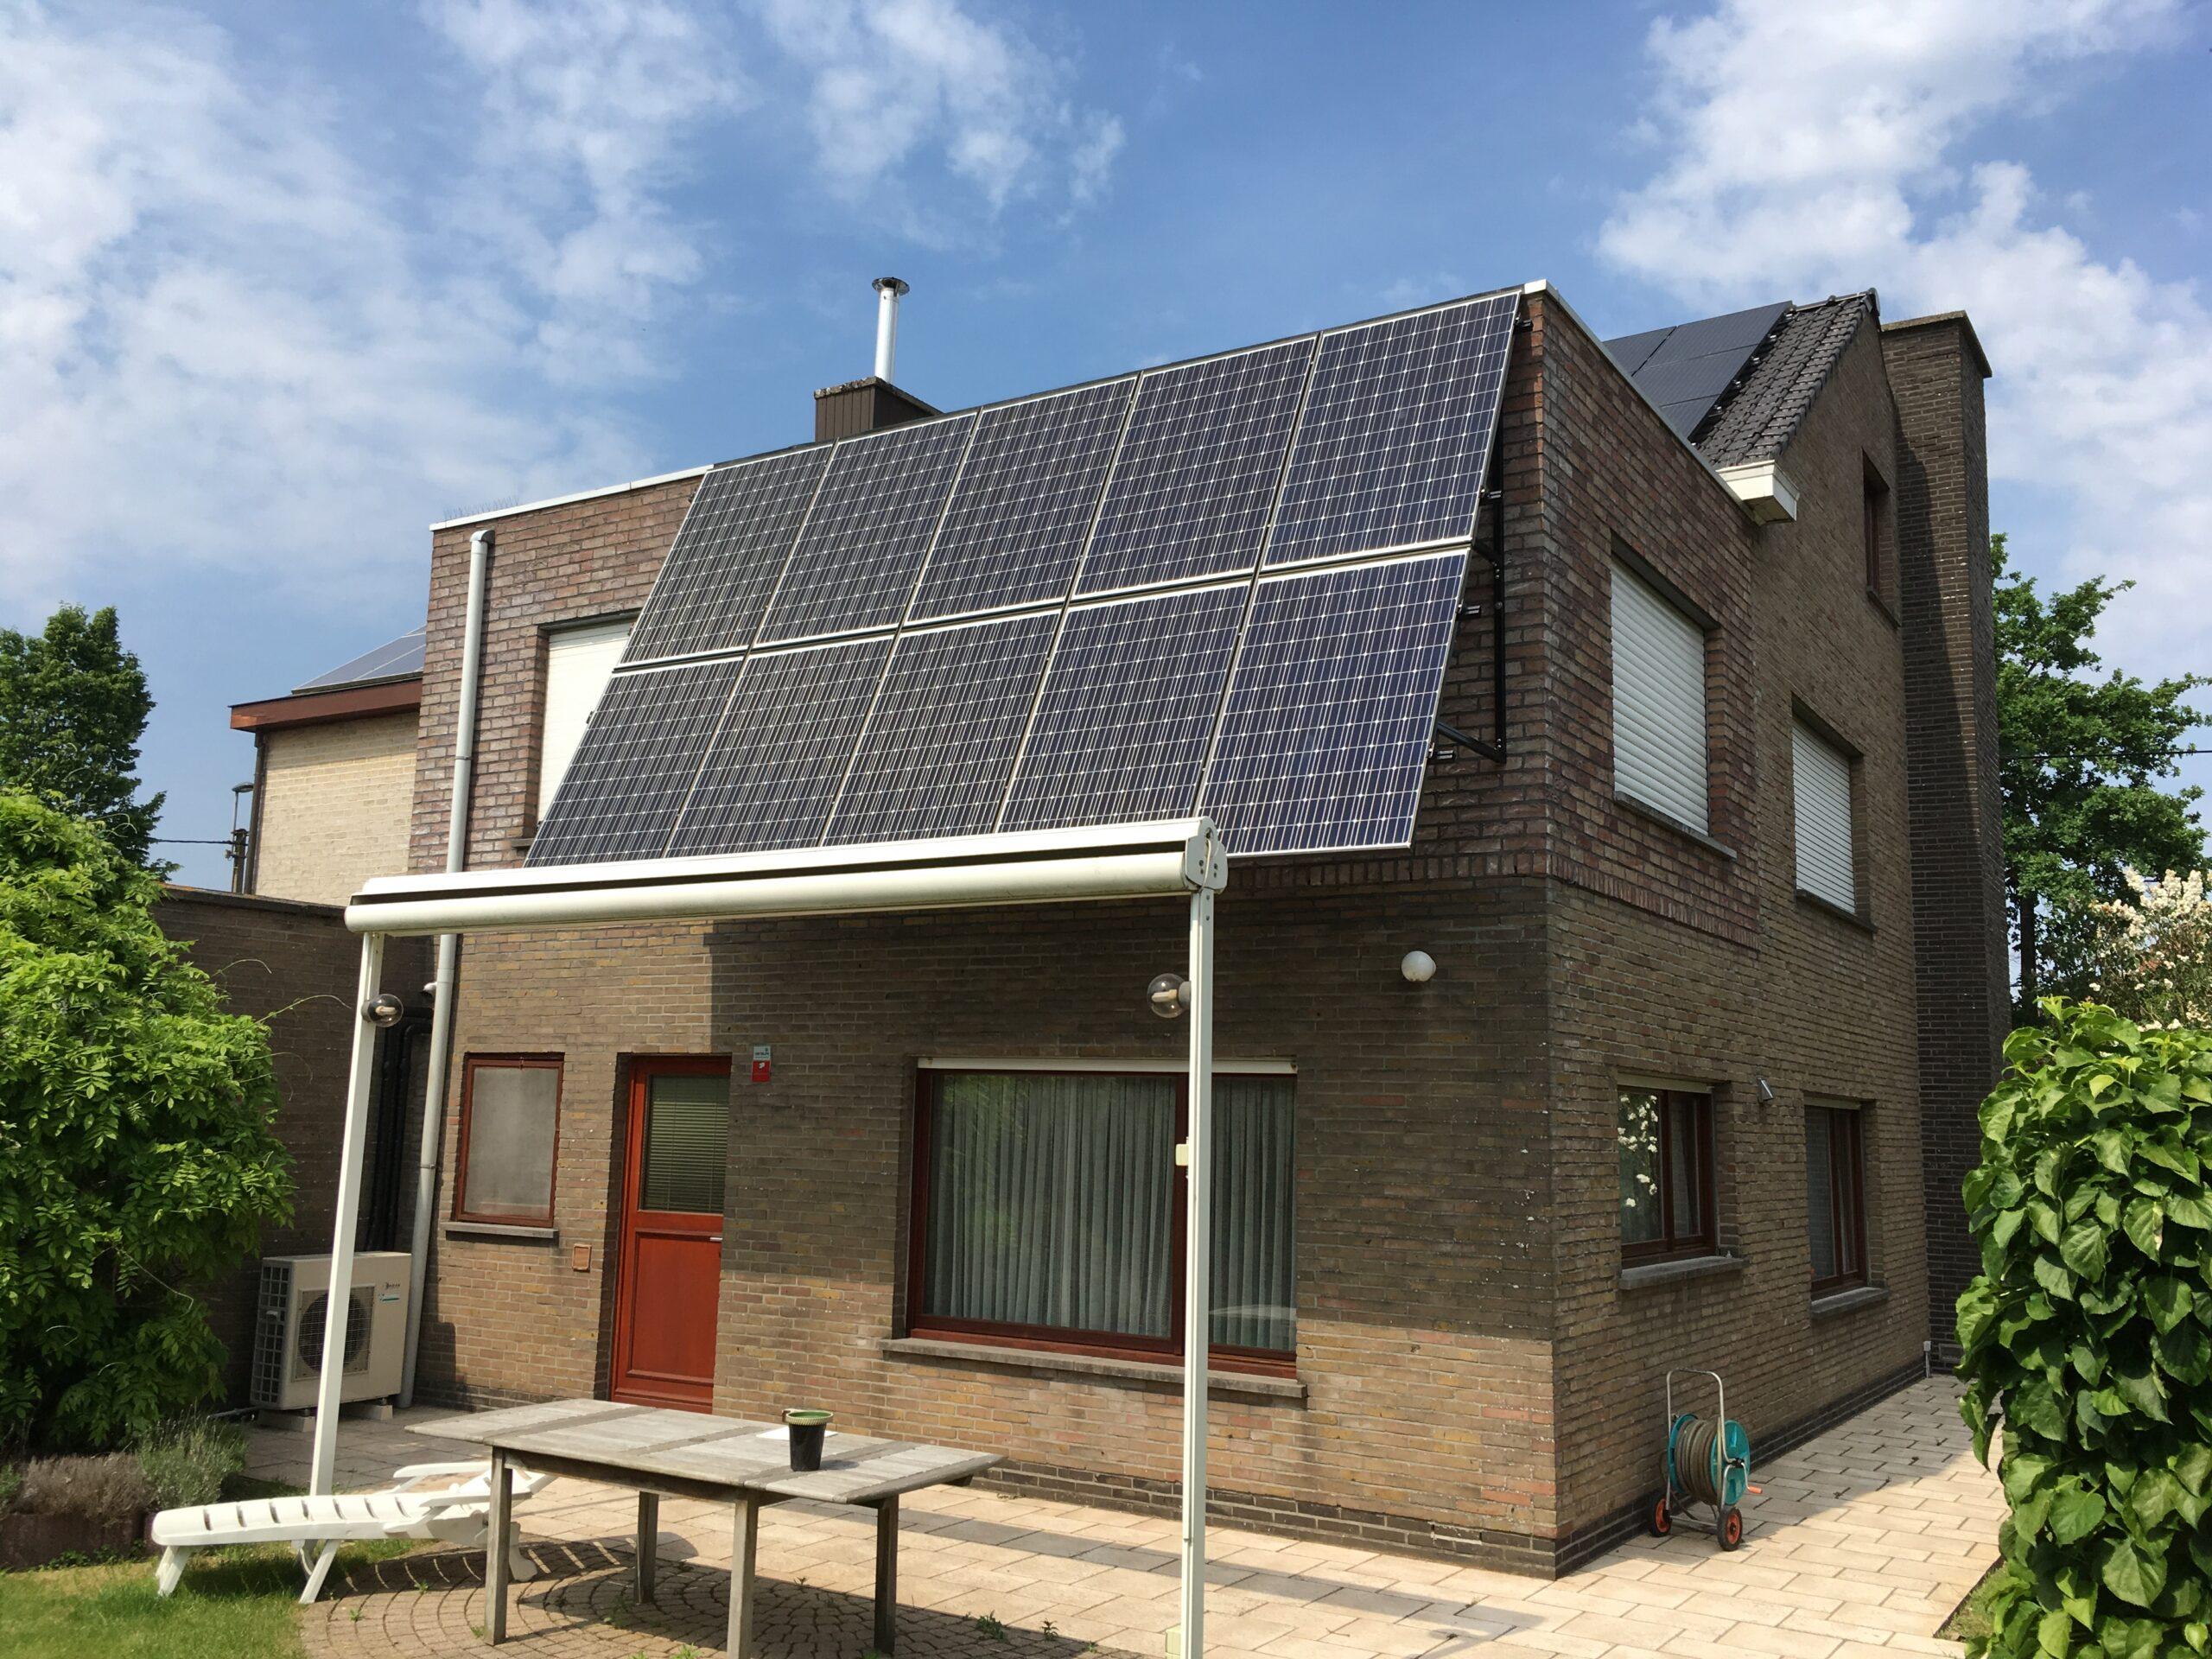 Warmtepomp en zonnepanelen 2